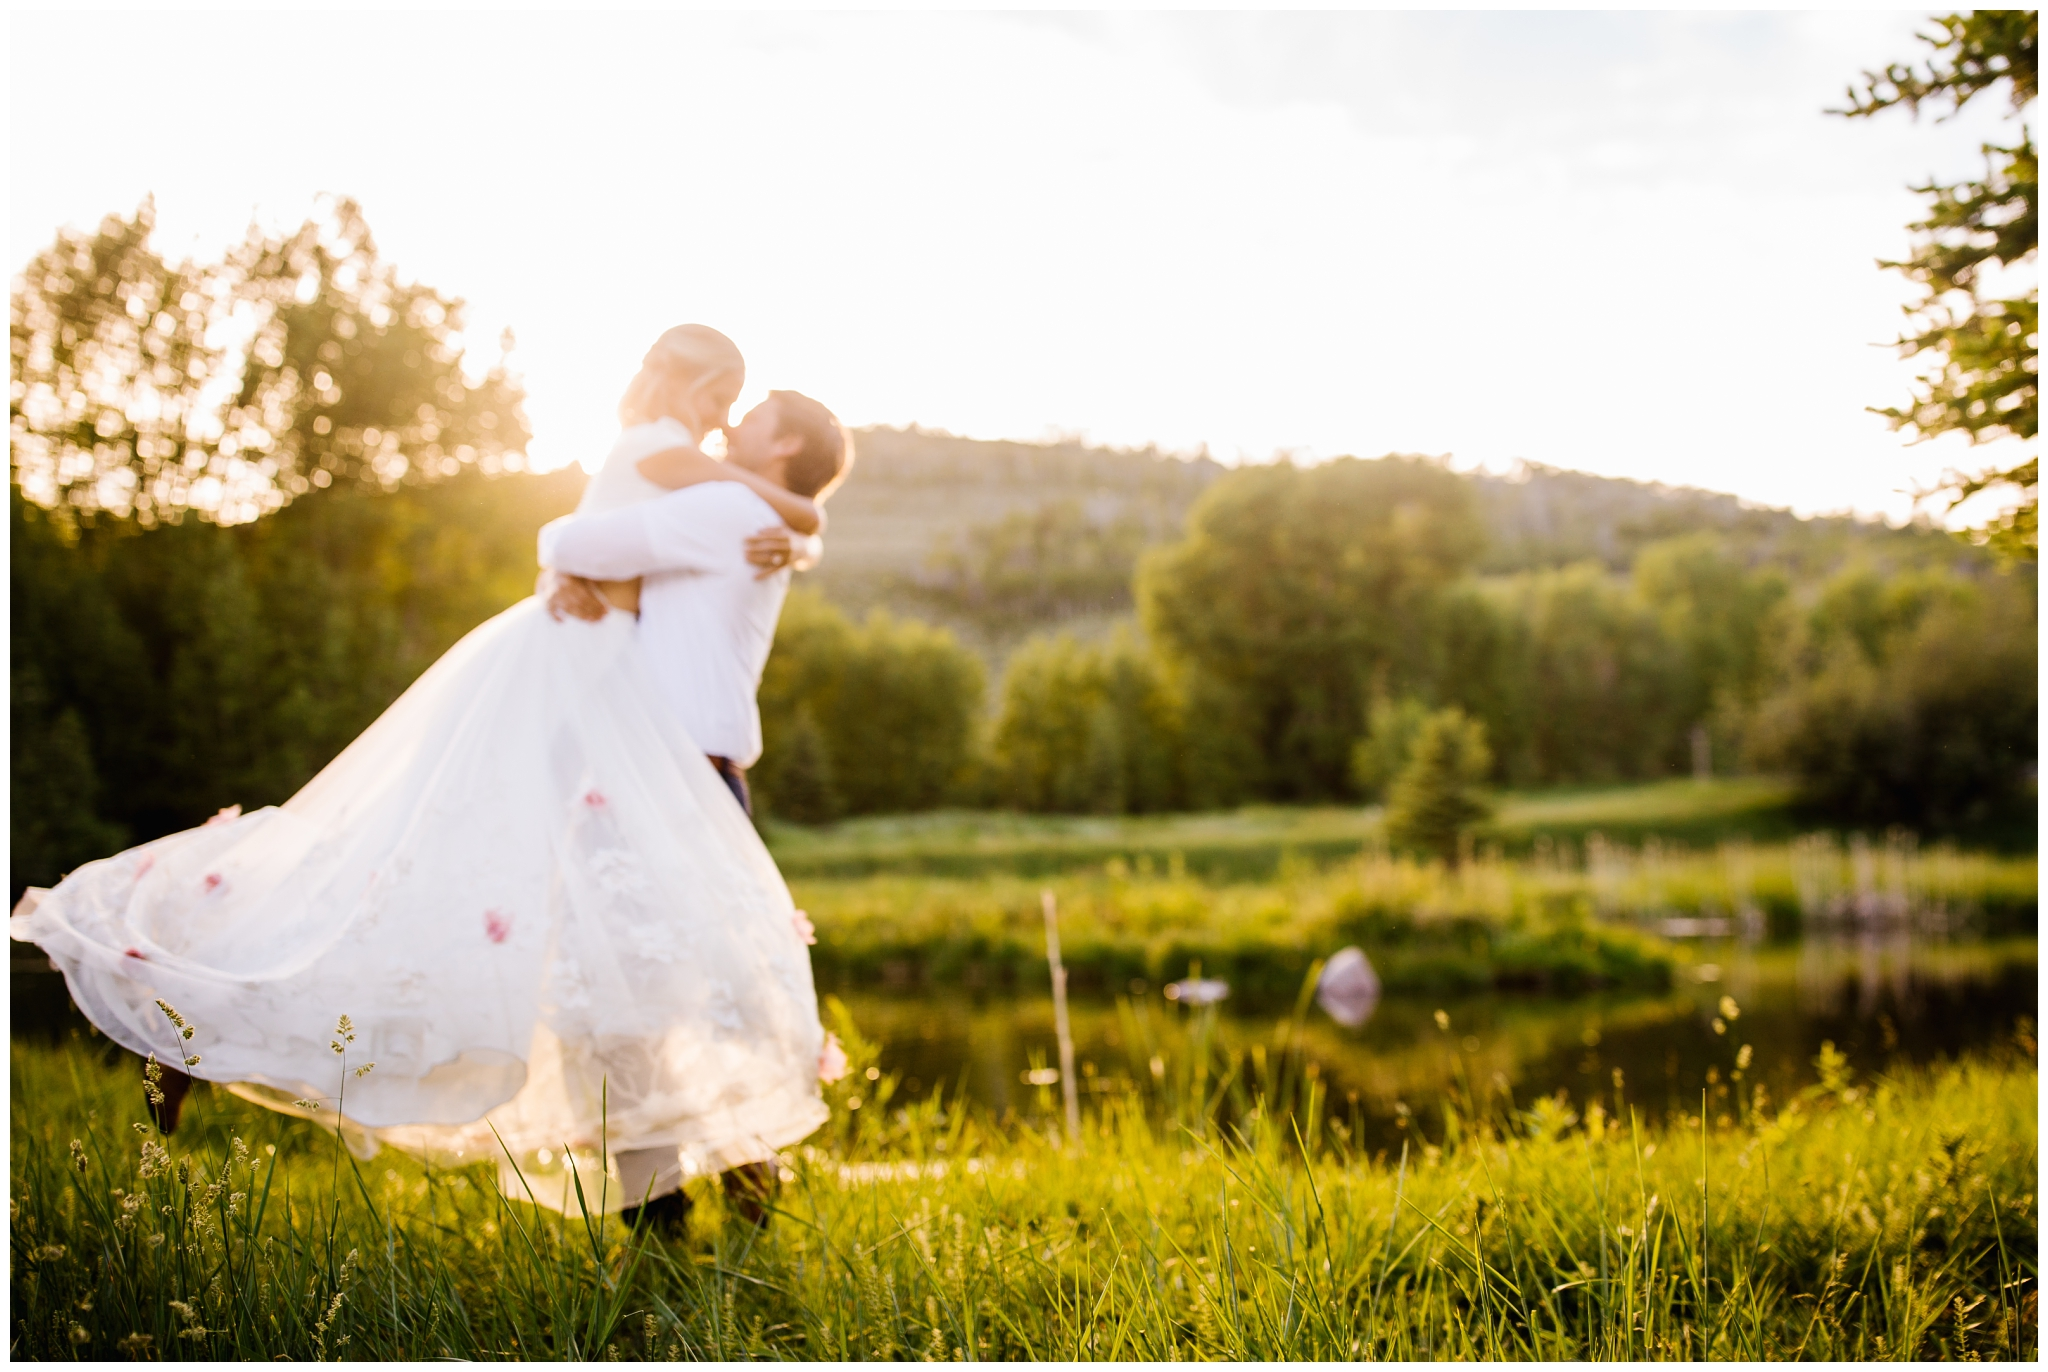 Lizzie-B-Imagery-Utah-Wedding-Photographer-Park-City-Photographer_0061.jpg